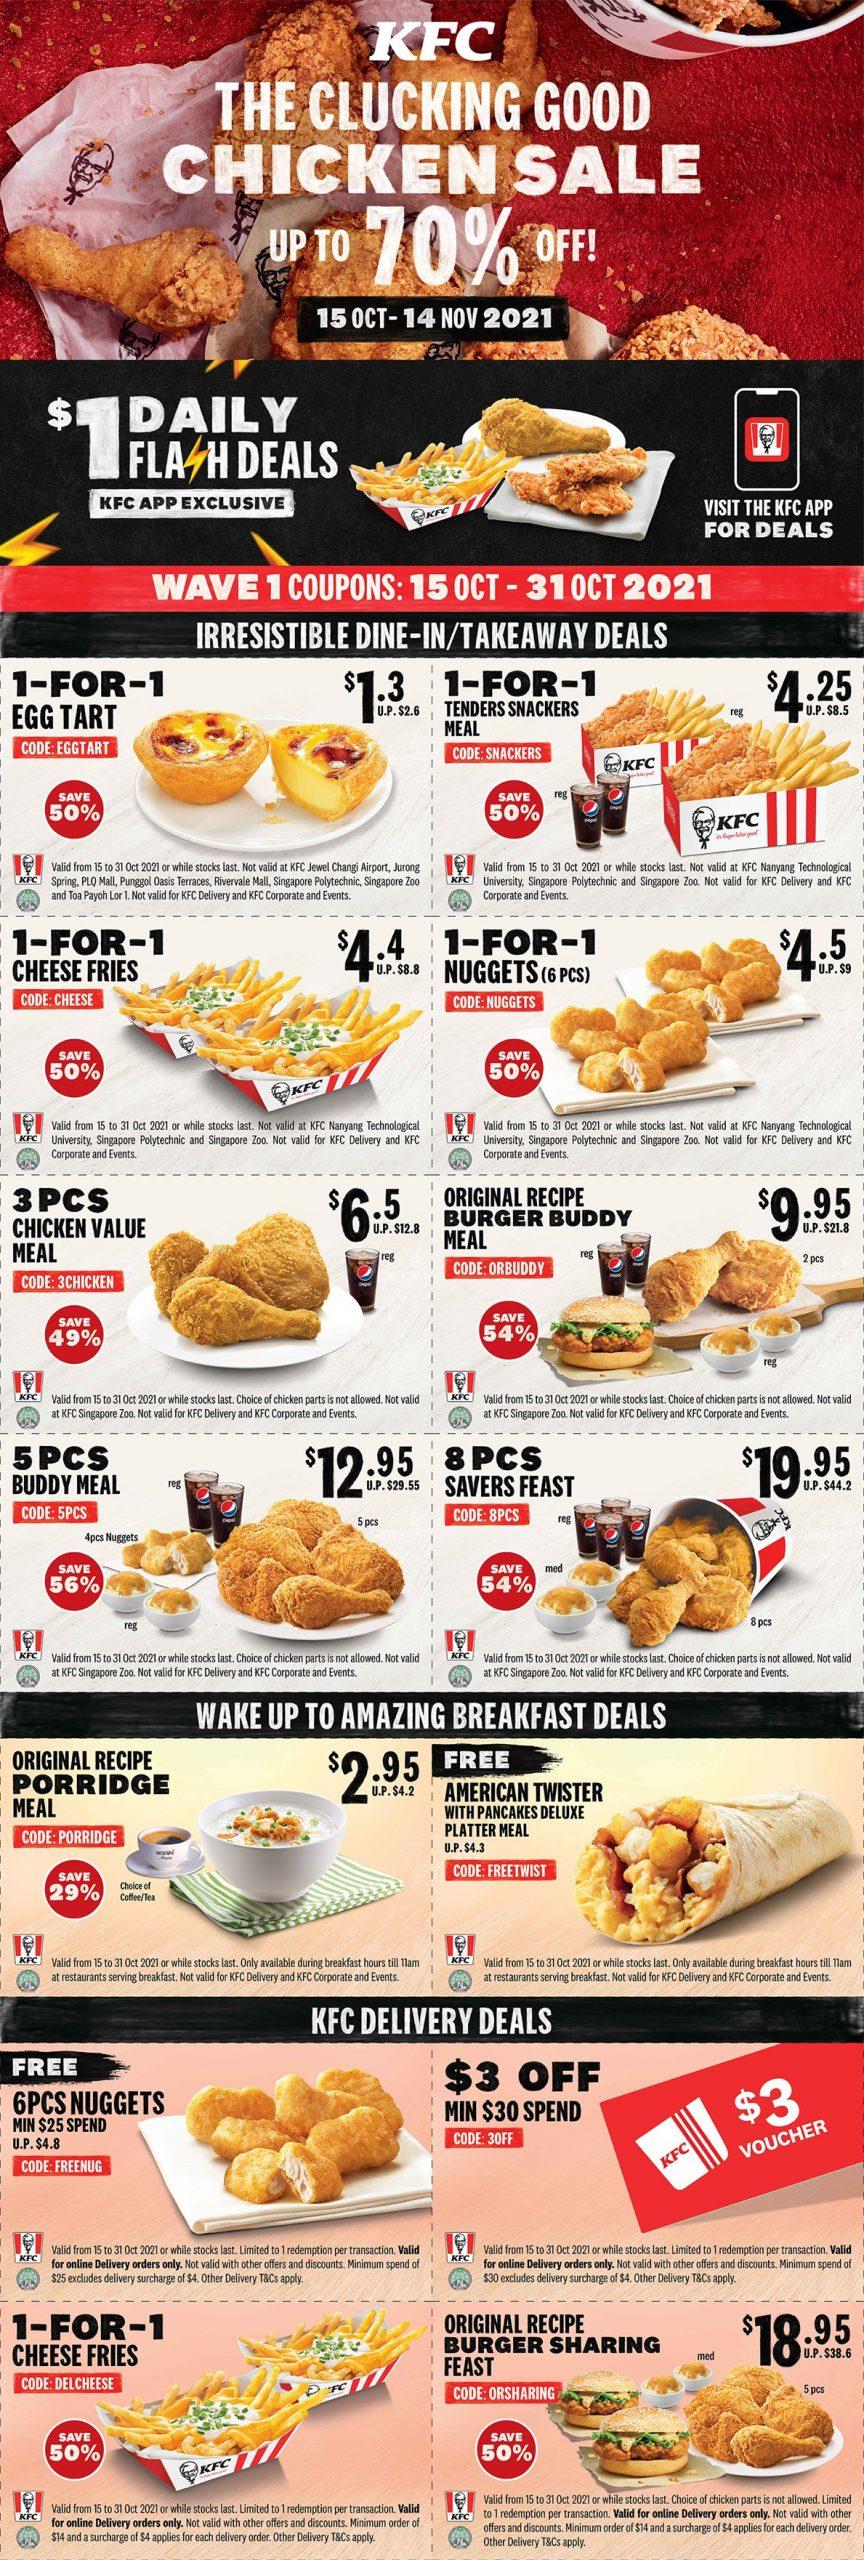 kfc promo coupon